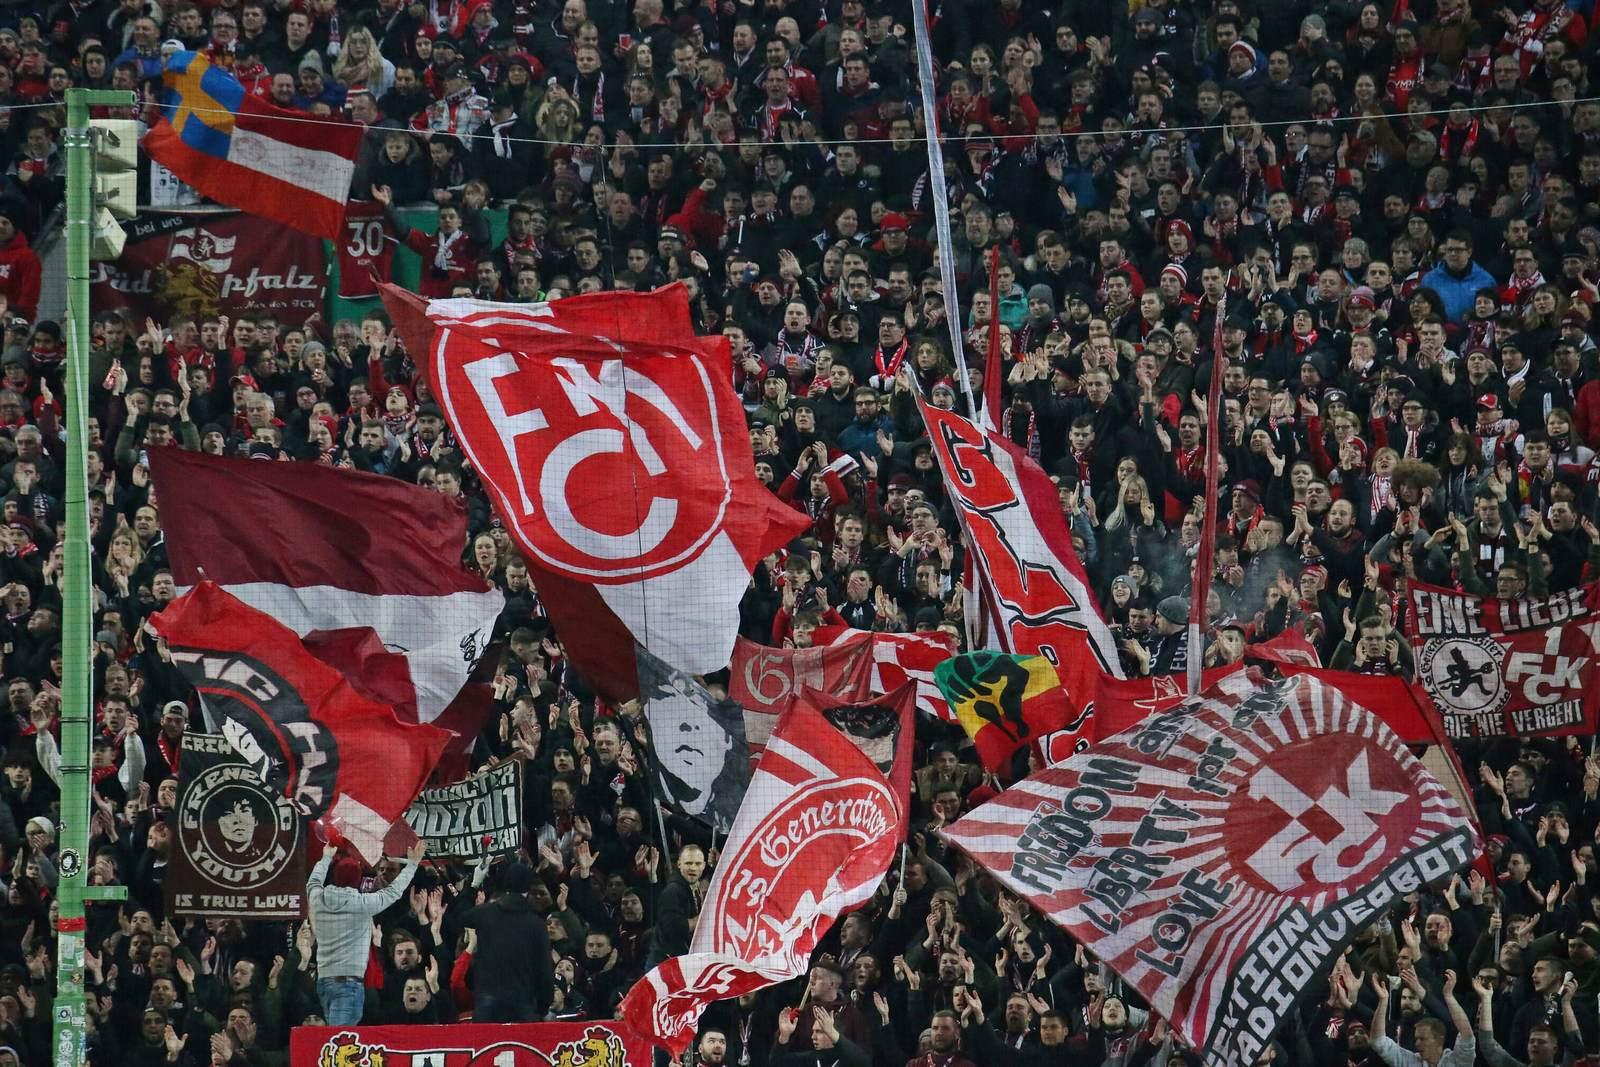 Fans des FCK auf dem Betzenberg